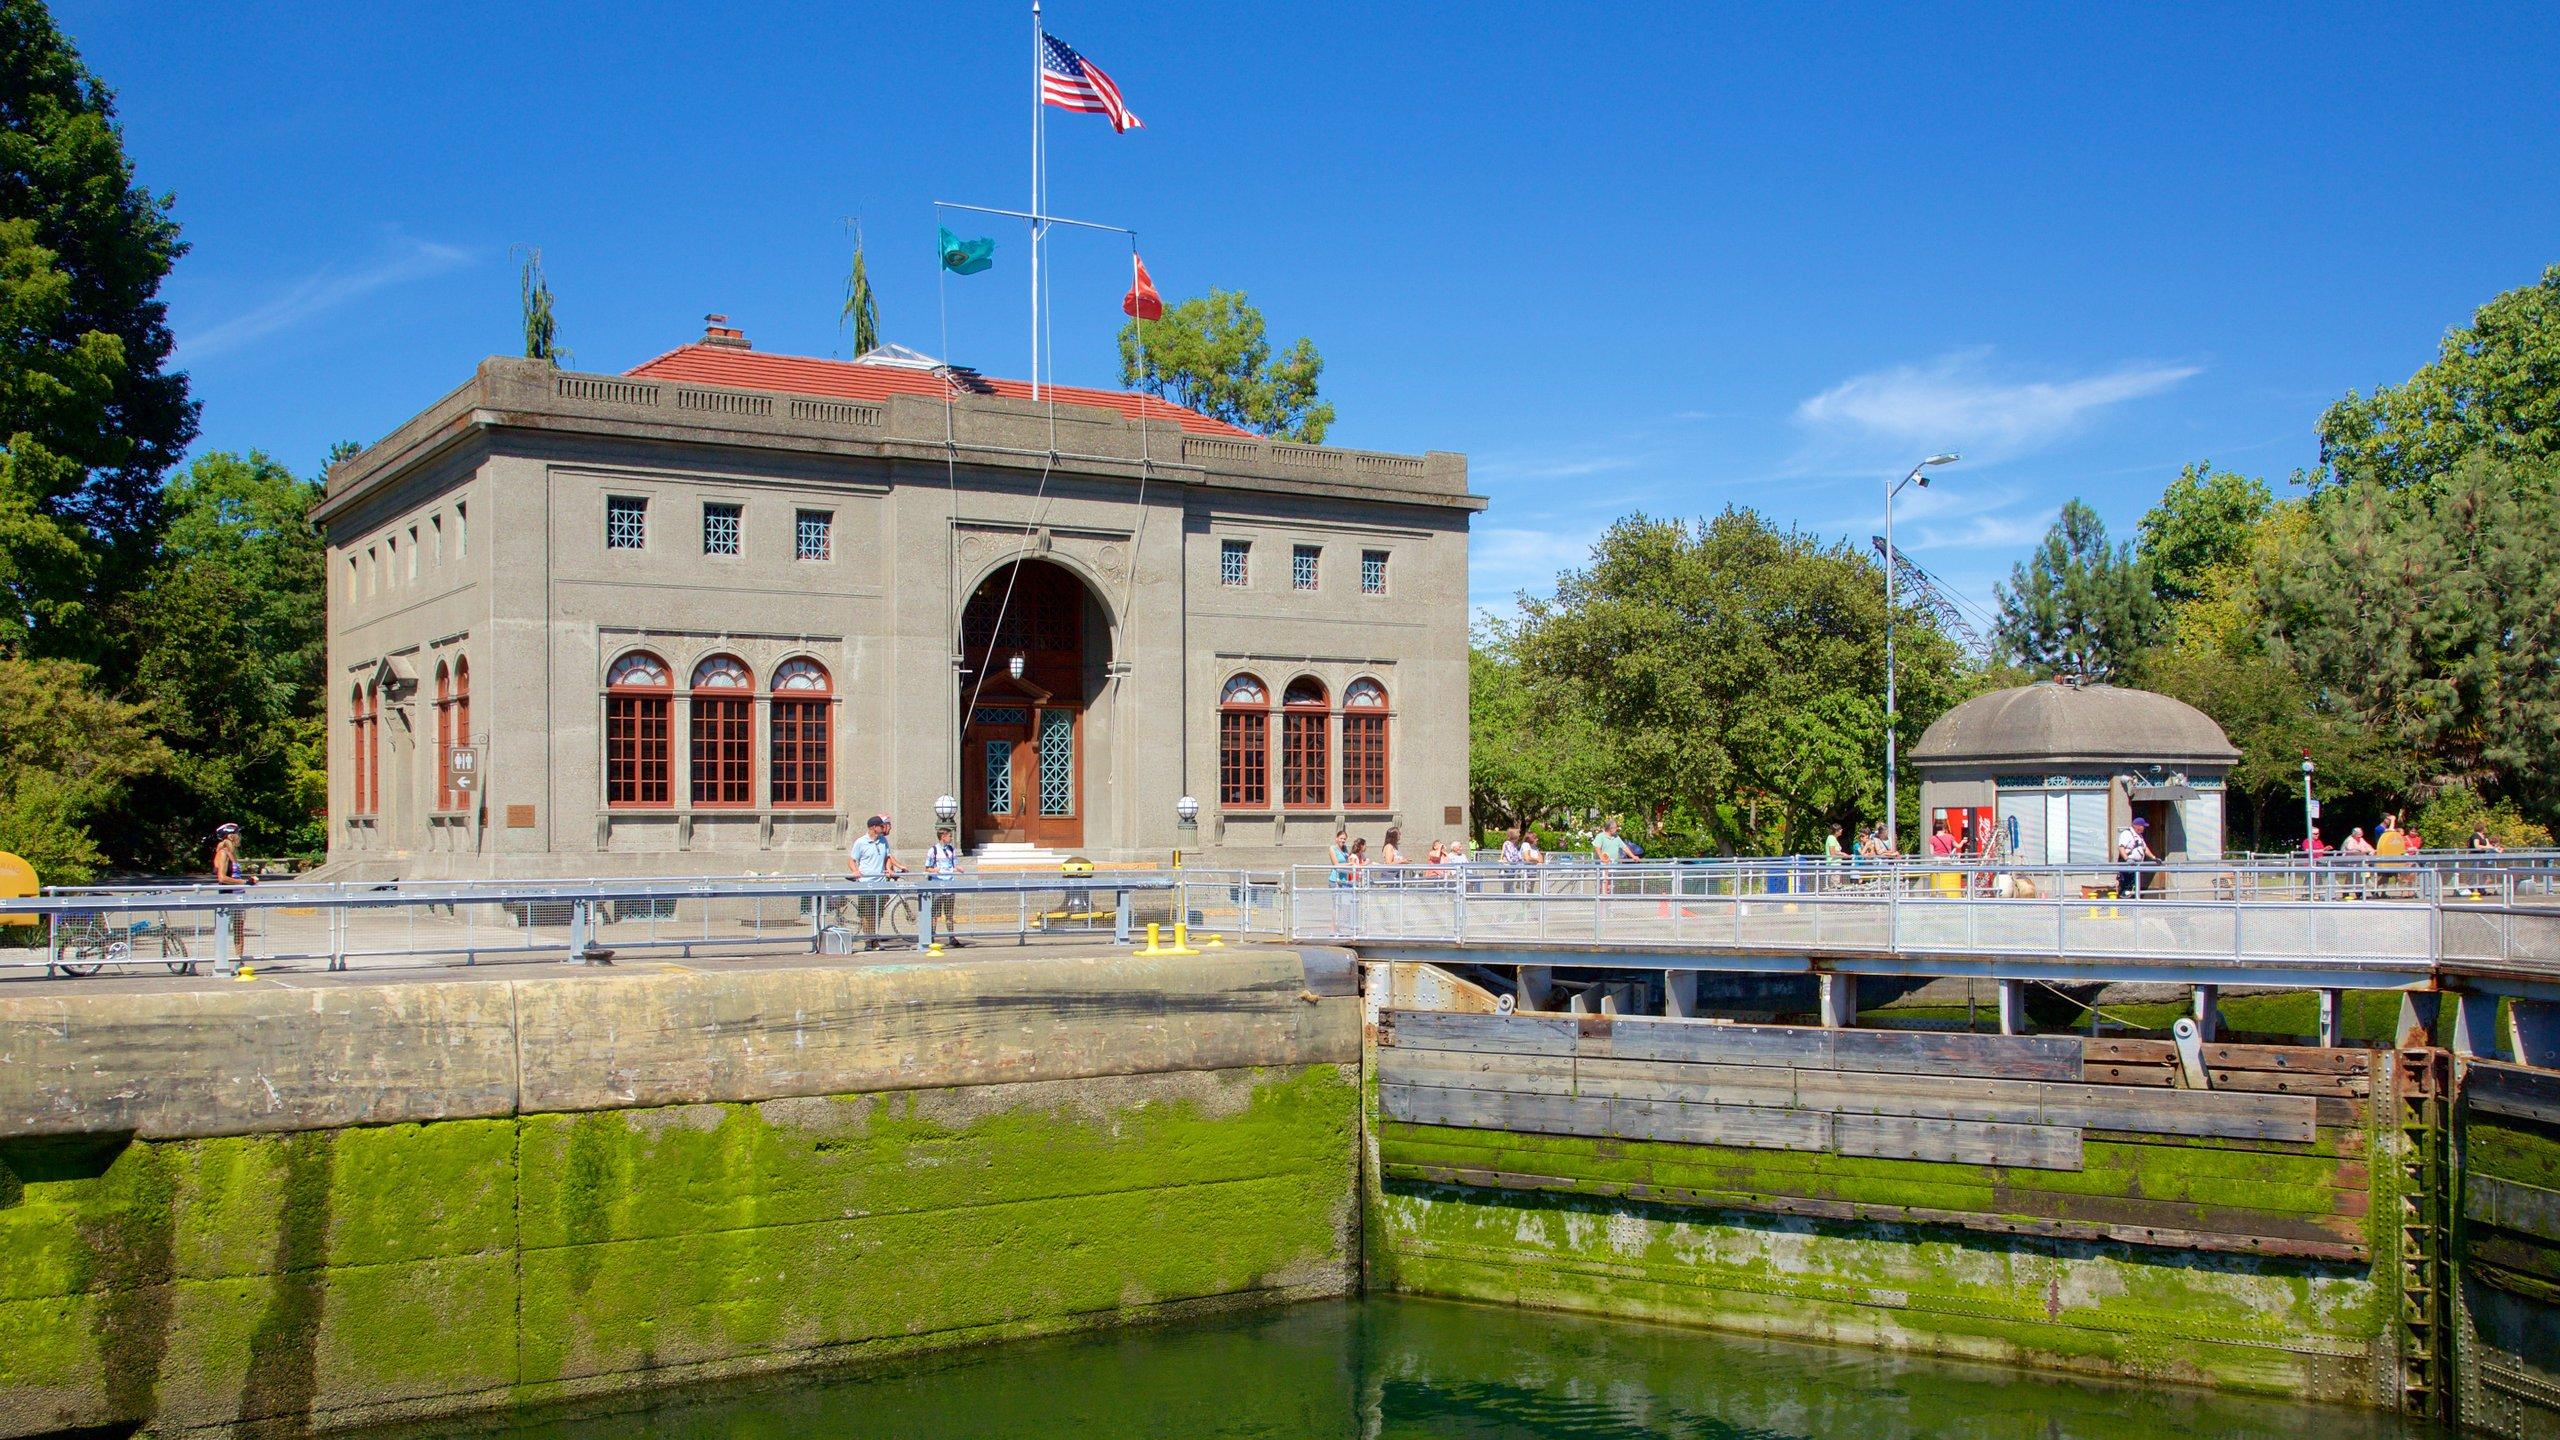 Ballard, Seattle, Washington, United States of America